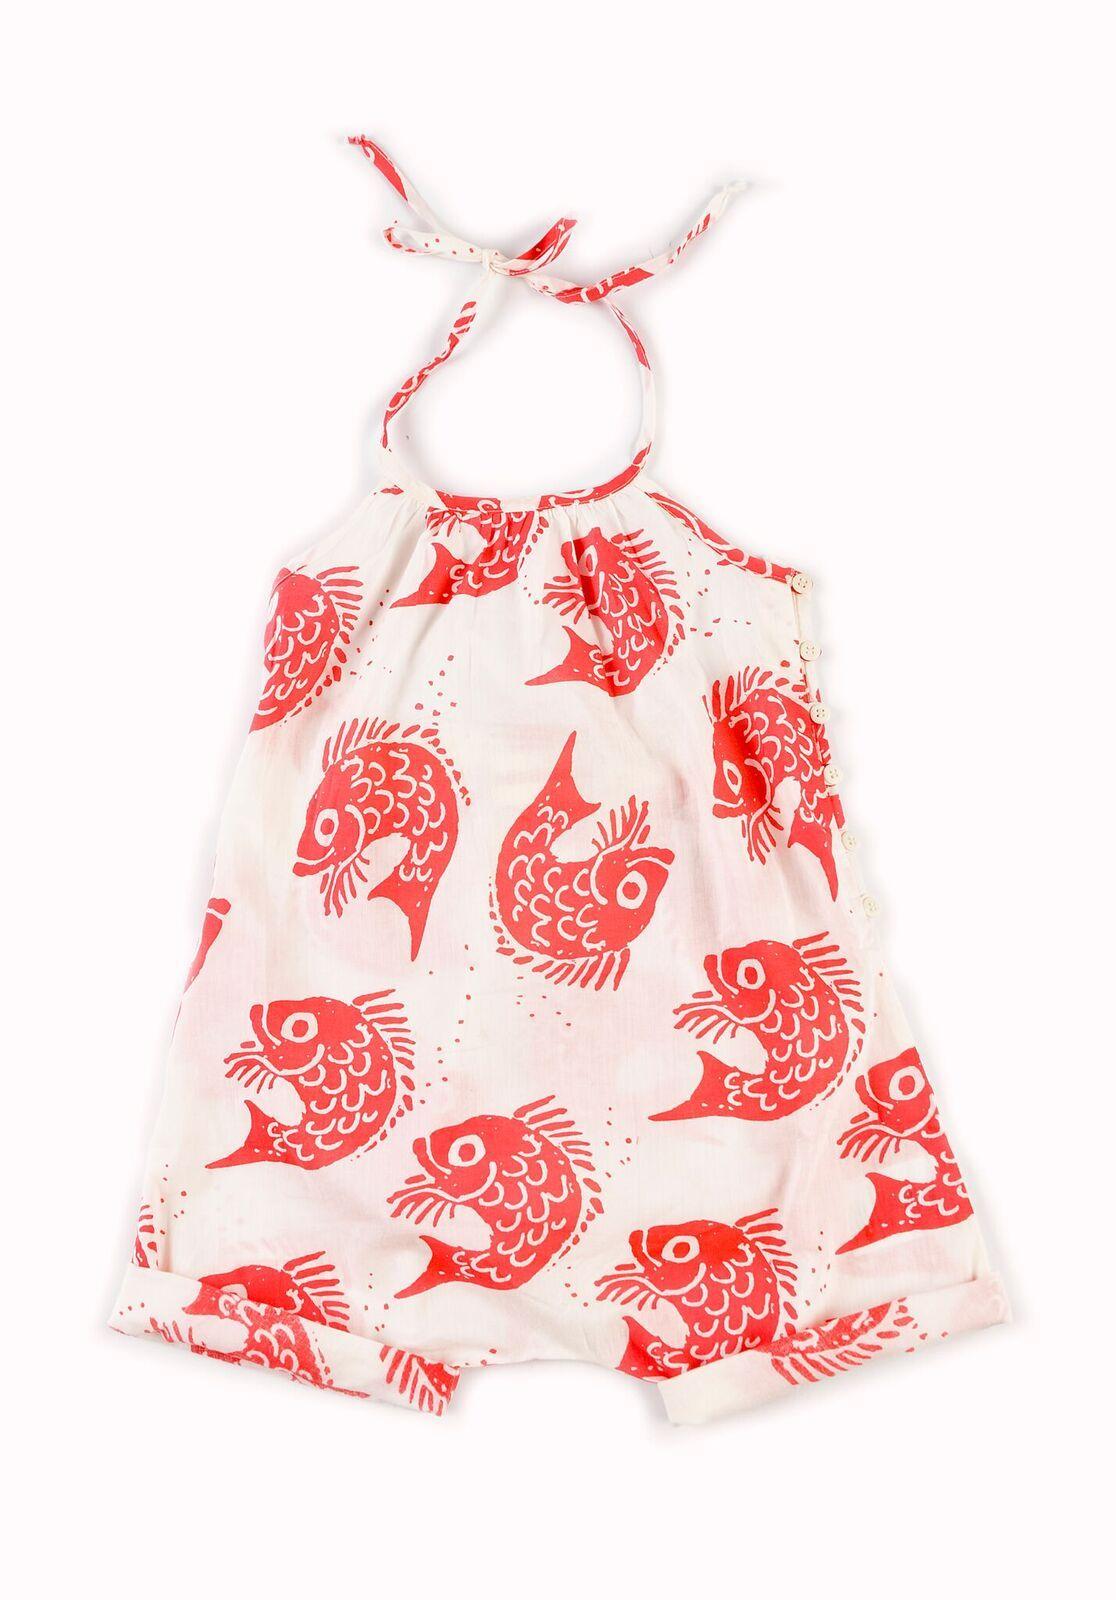 6d64b18e5c4 Υπέροχη φόρμα με κουμπάκια στο πλάι για εύκολο ντύσιμο από την Nadadelazos  και την κολλεξιόν Kiyoko